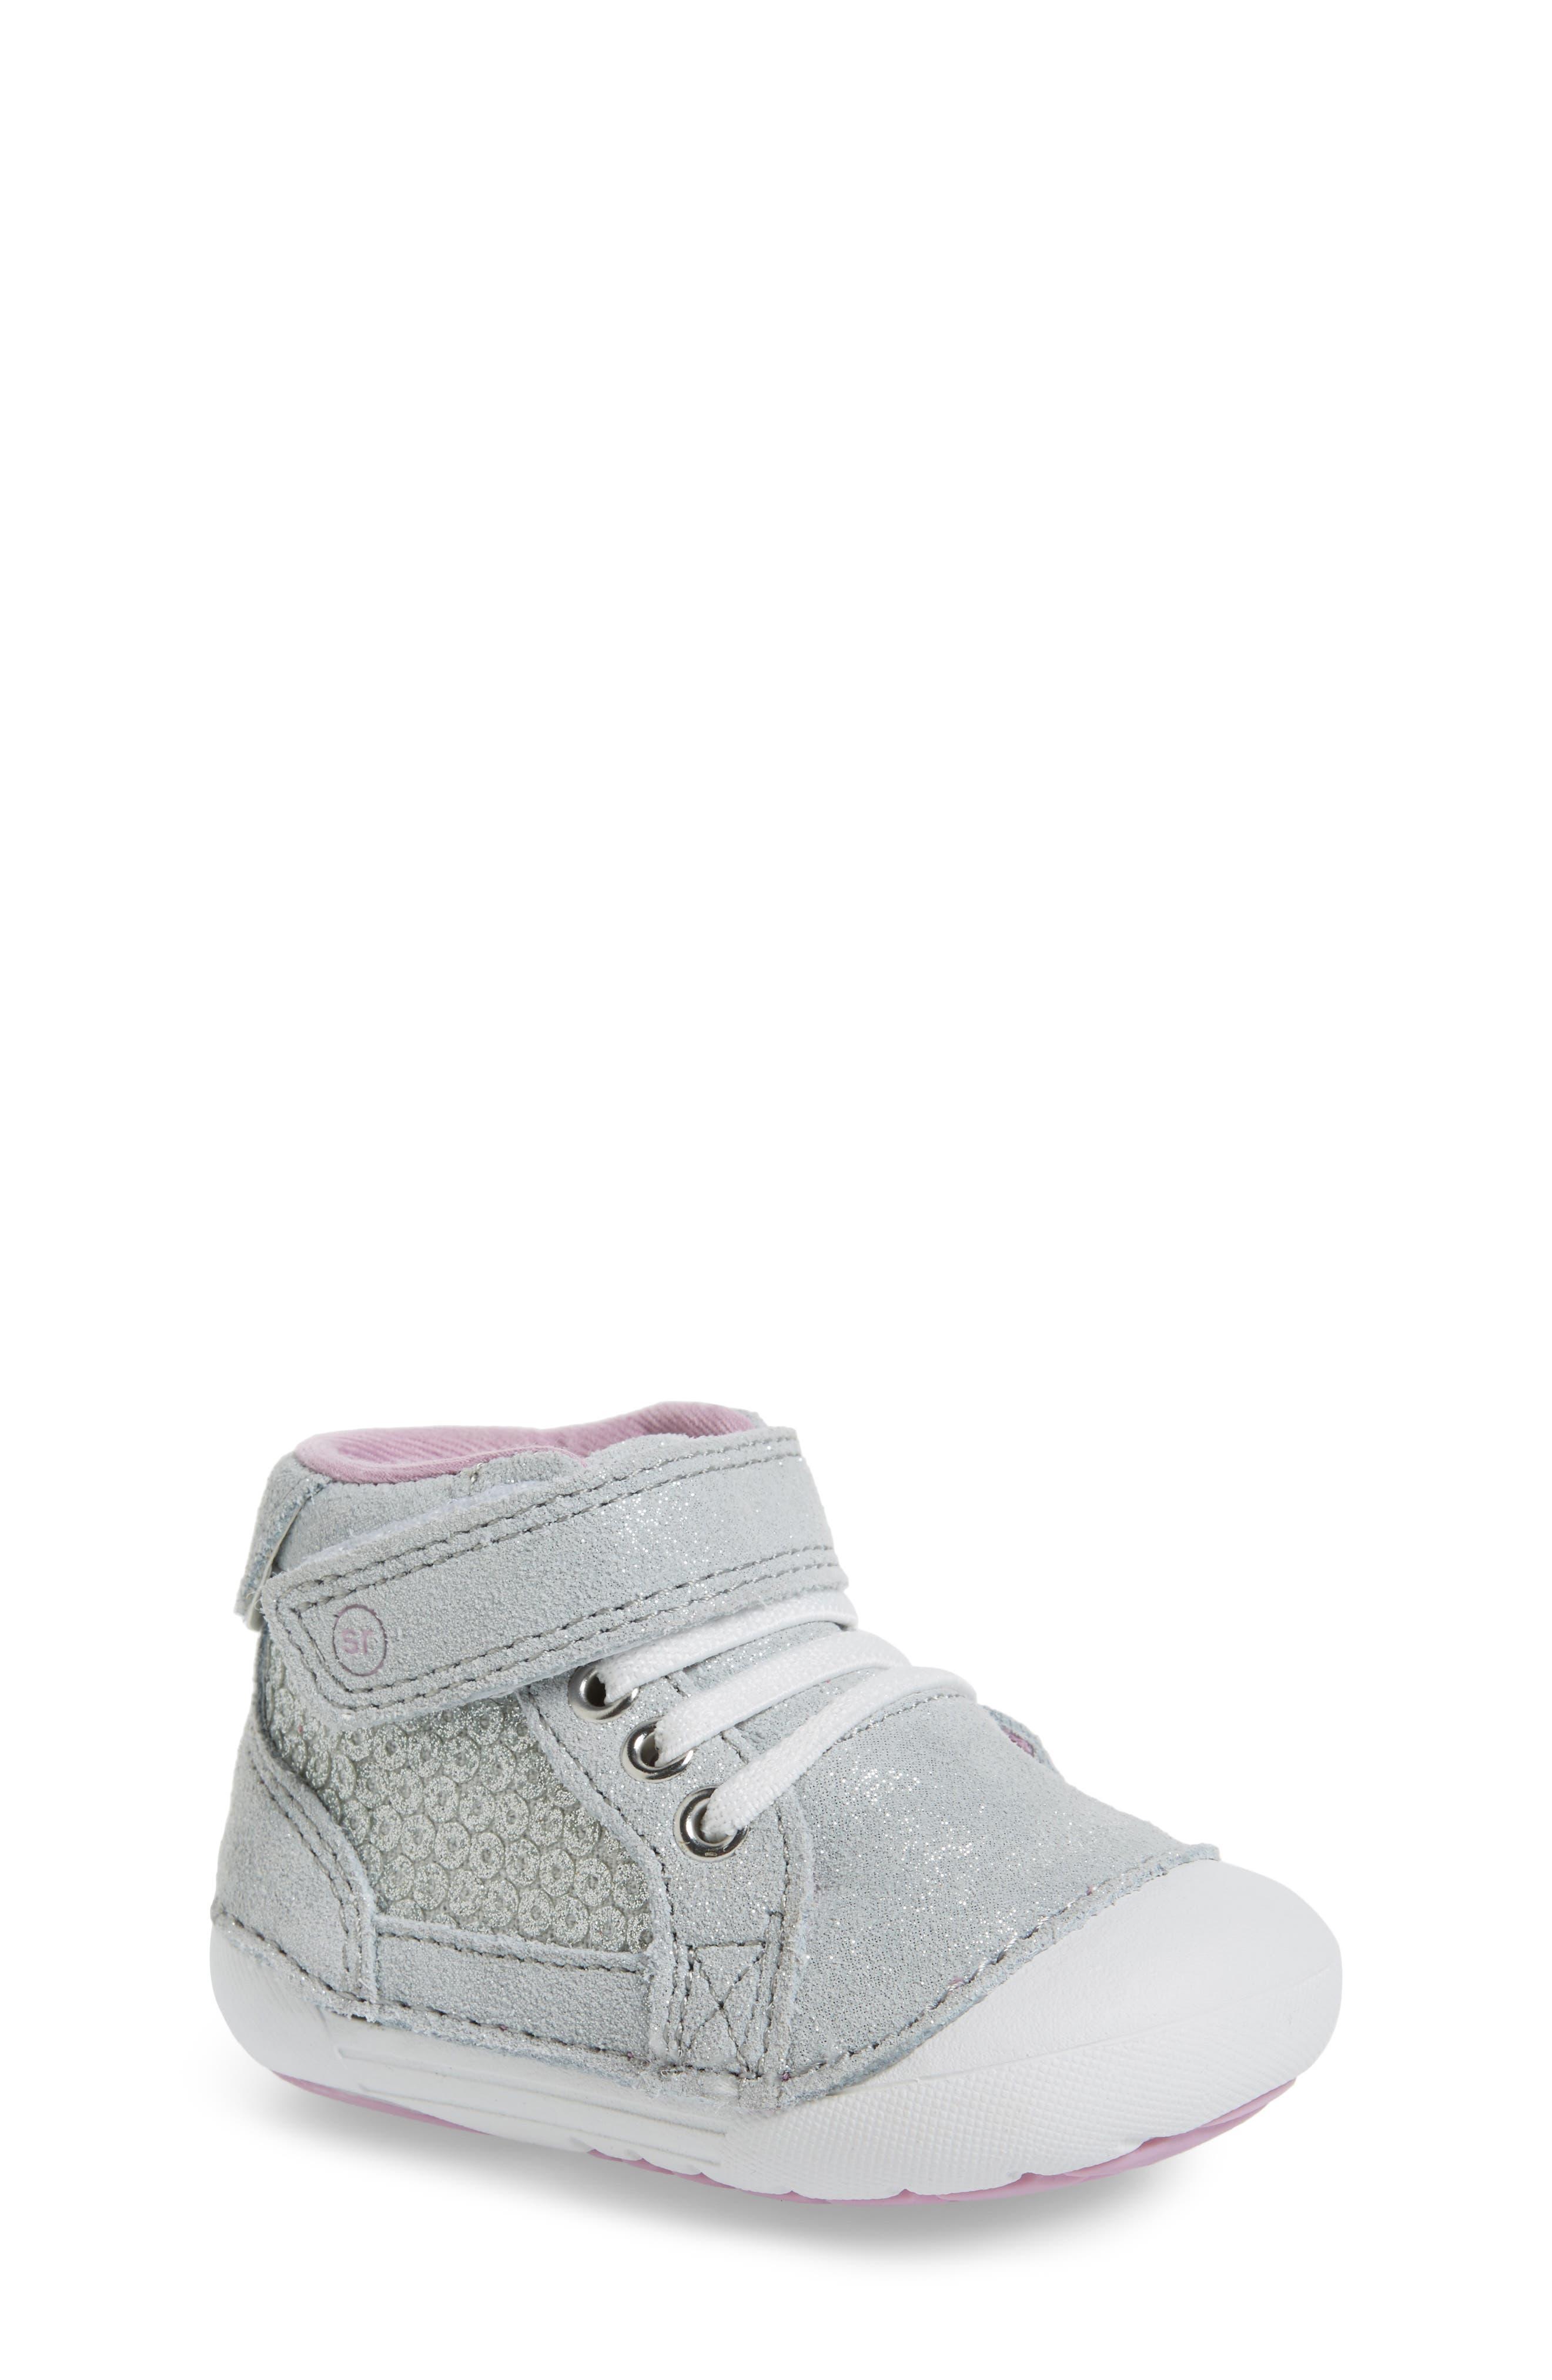 Stride Rite Soft Motion™ Jada High Top Sneaker (Baby & Walker)